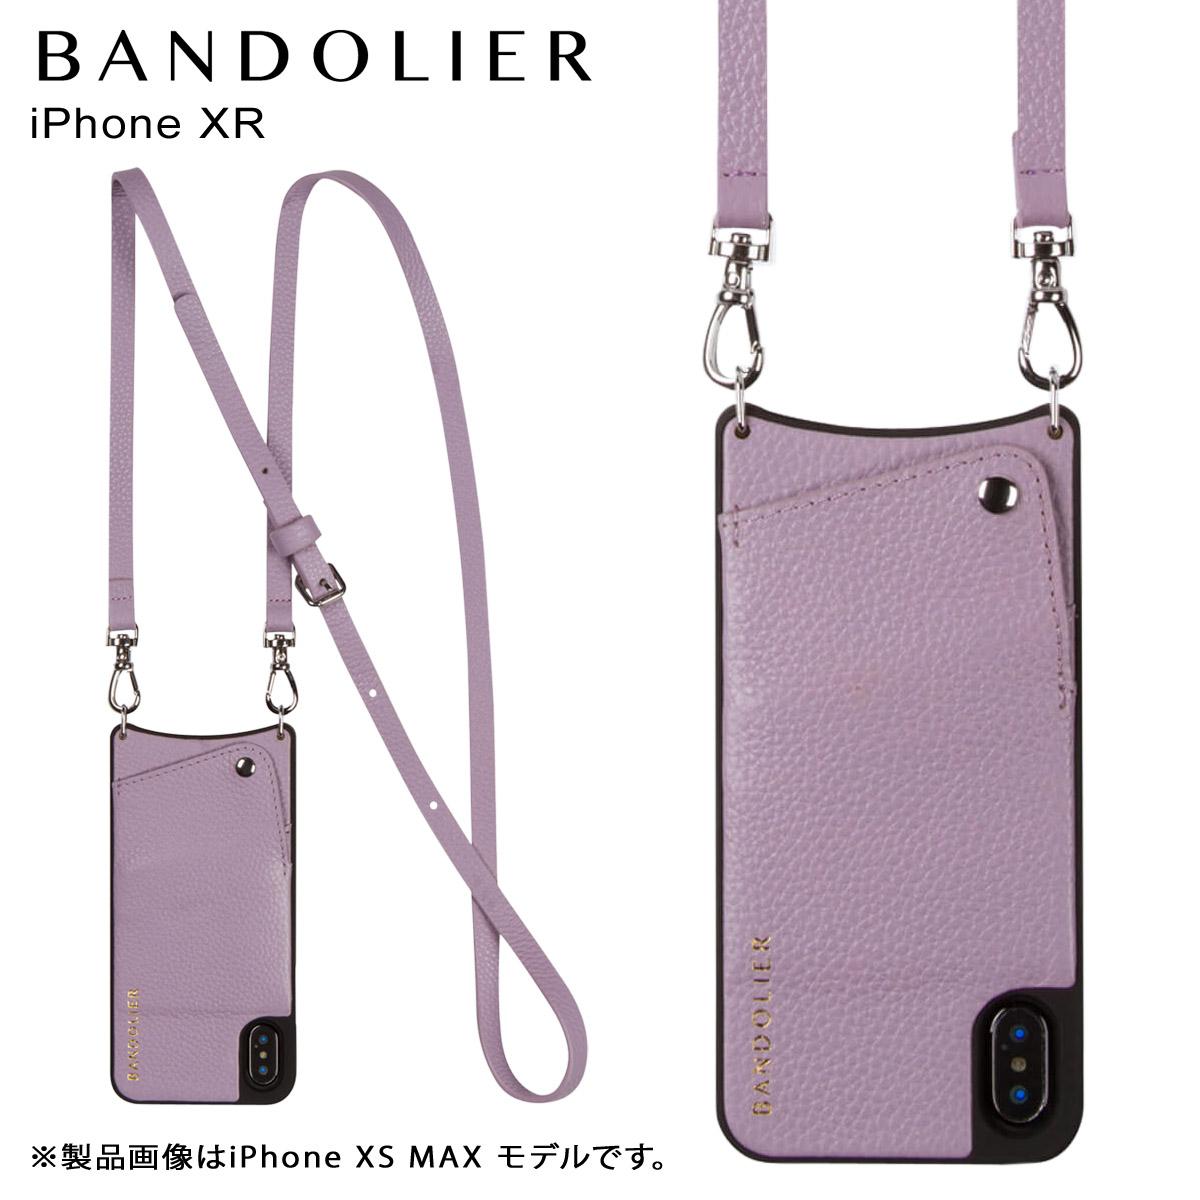 BANDOLIER iPhone XR EMMA LILAC バンドリヤー ケース ショルダー スマホ アイフォン レザー メンズ レディース ライラック 10EMM1001 [予約商品 4月下旬頃入荷予定 再入荷]